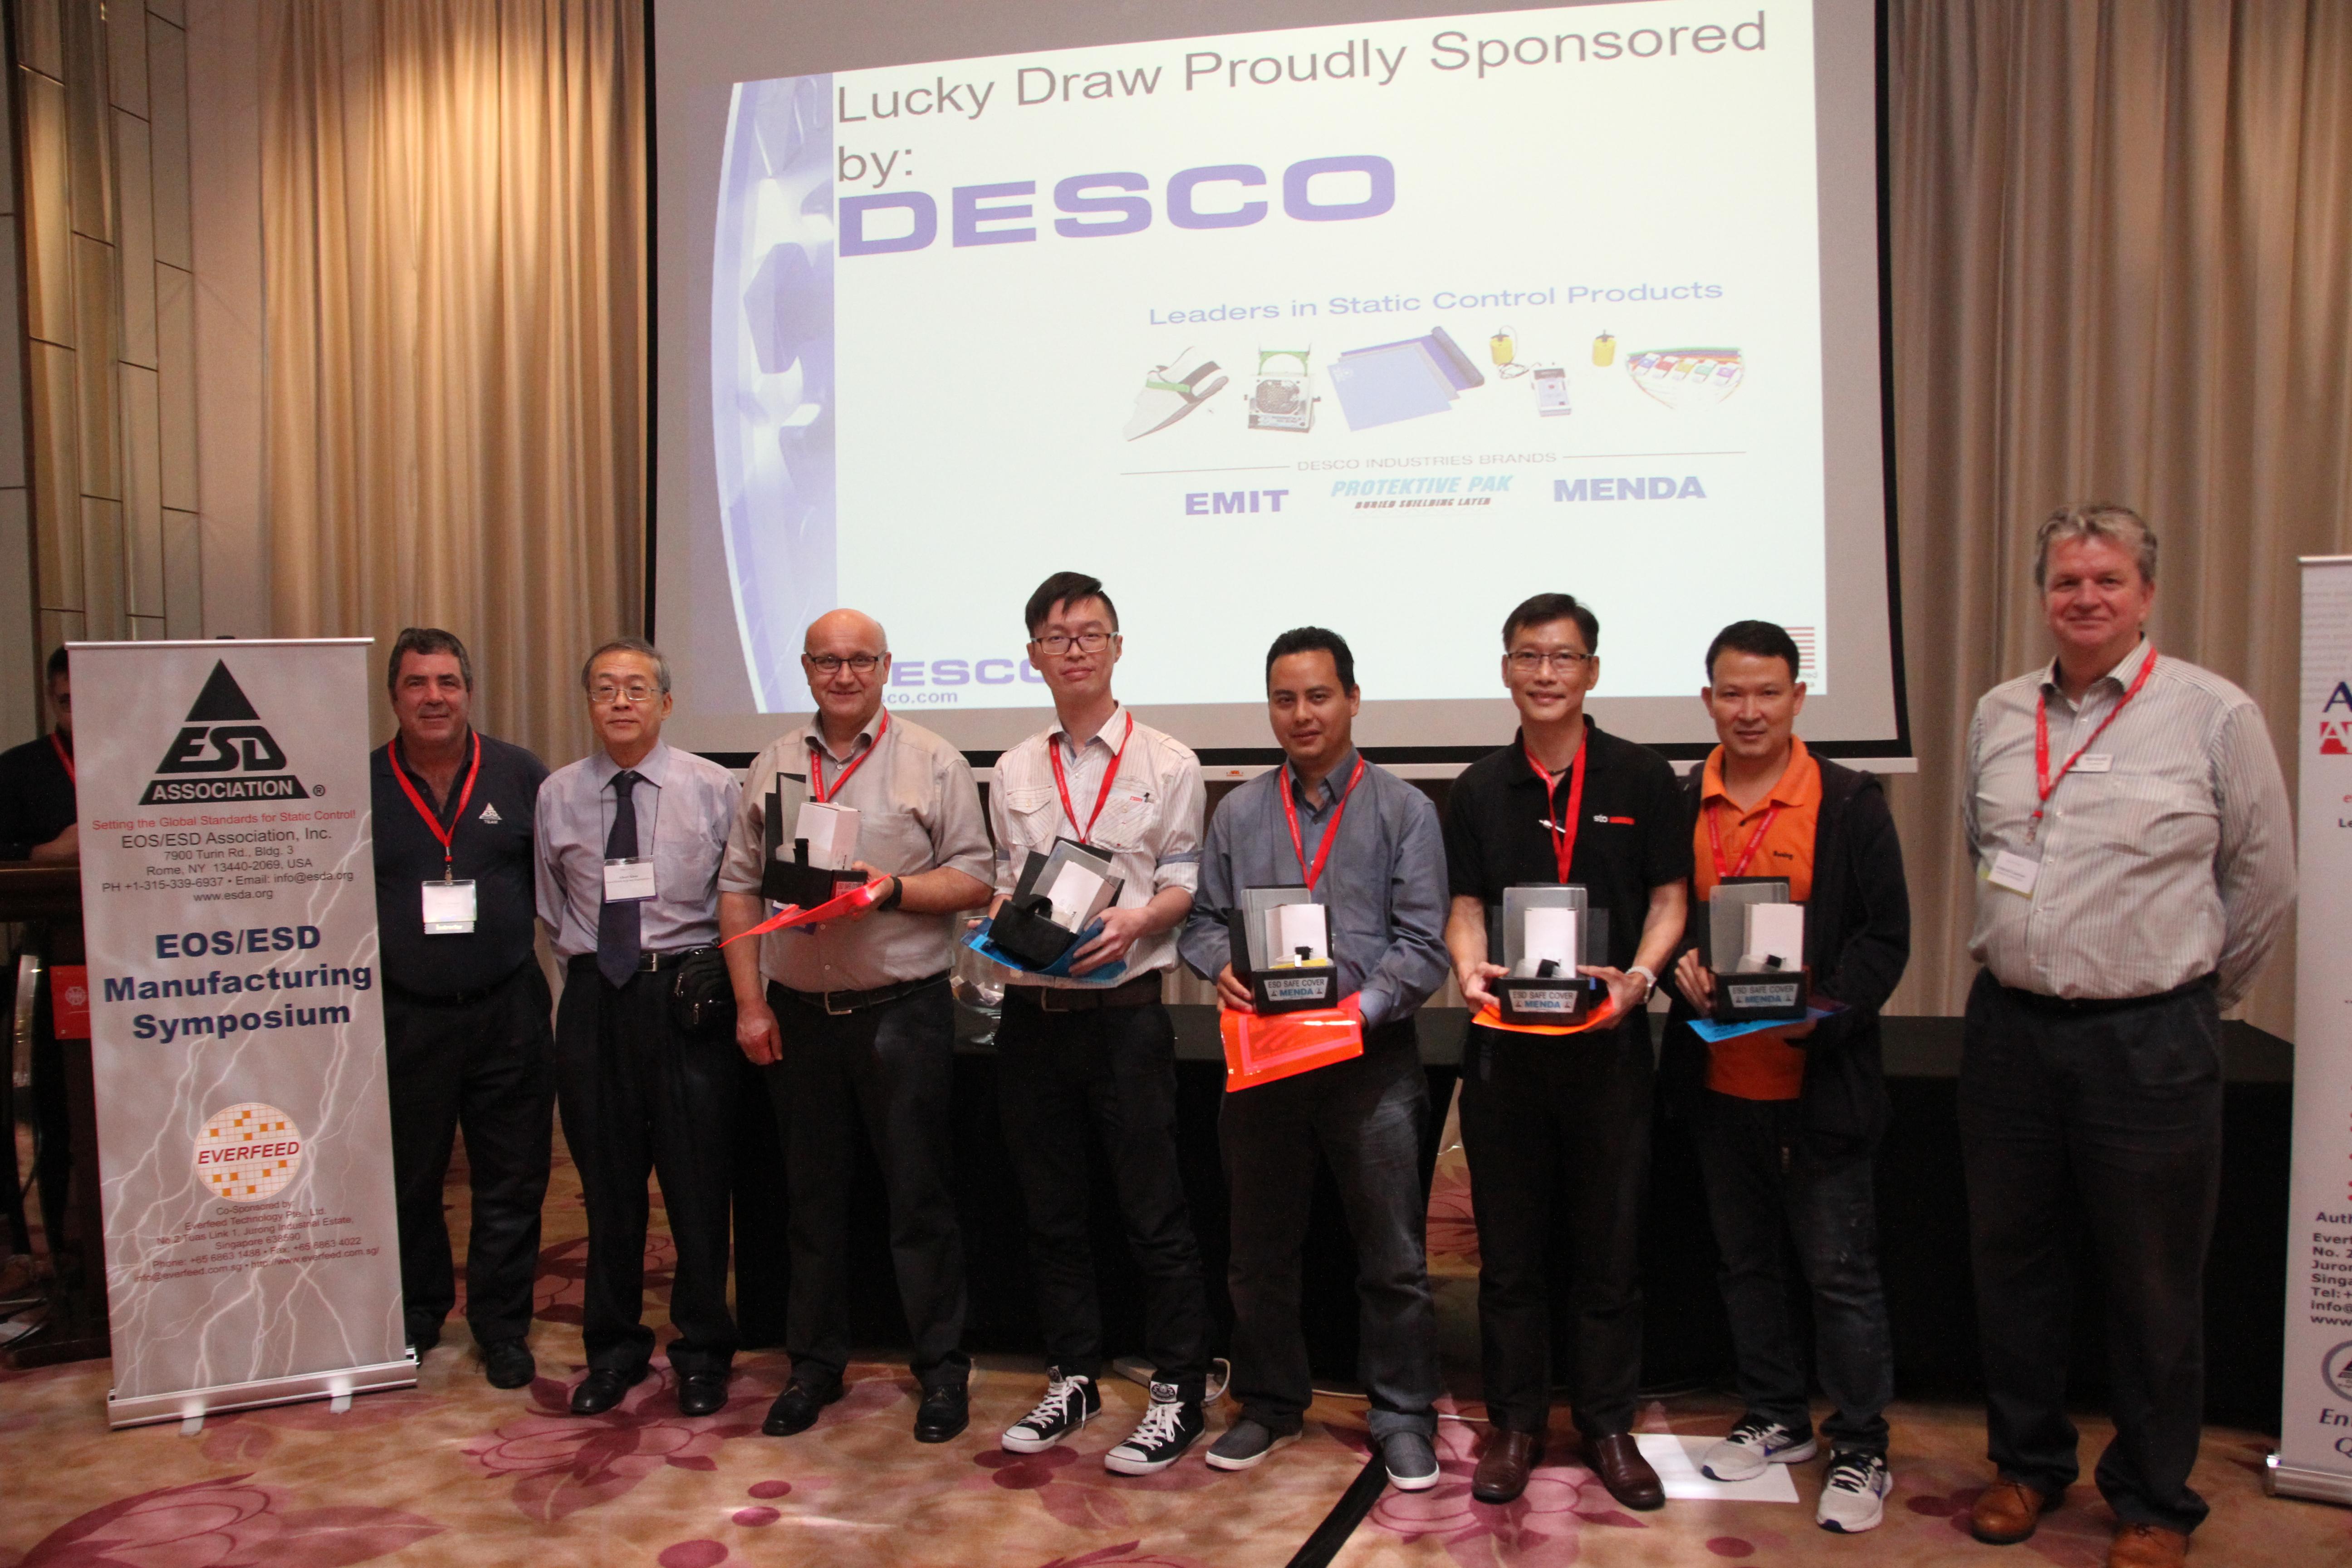 Desco Lcucky Draw Winners